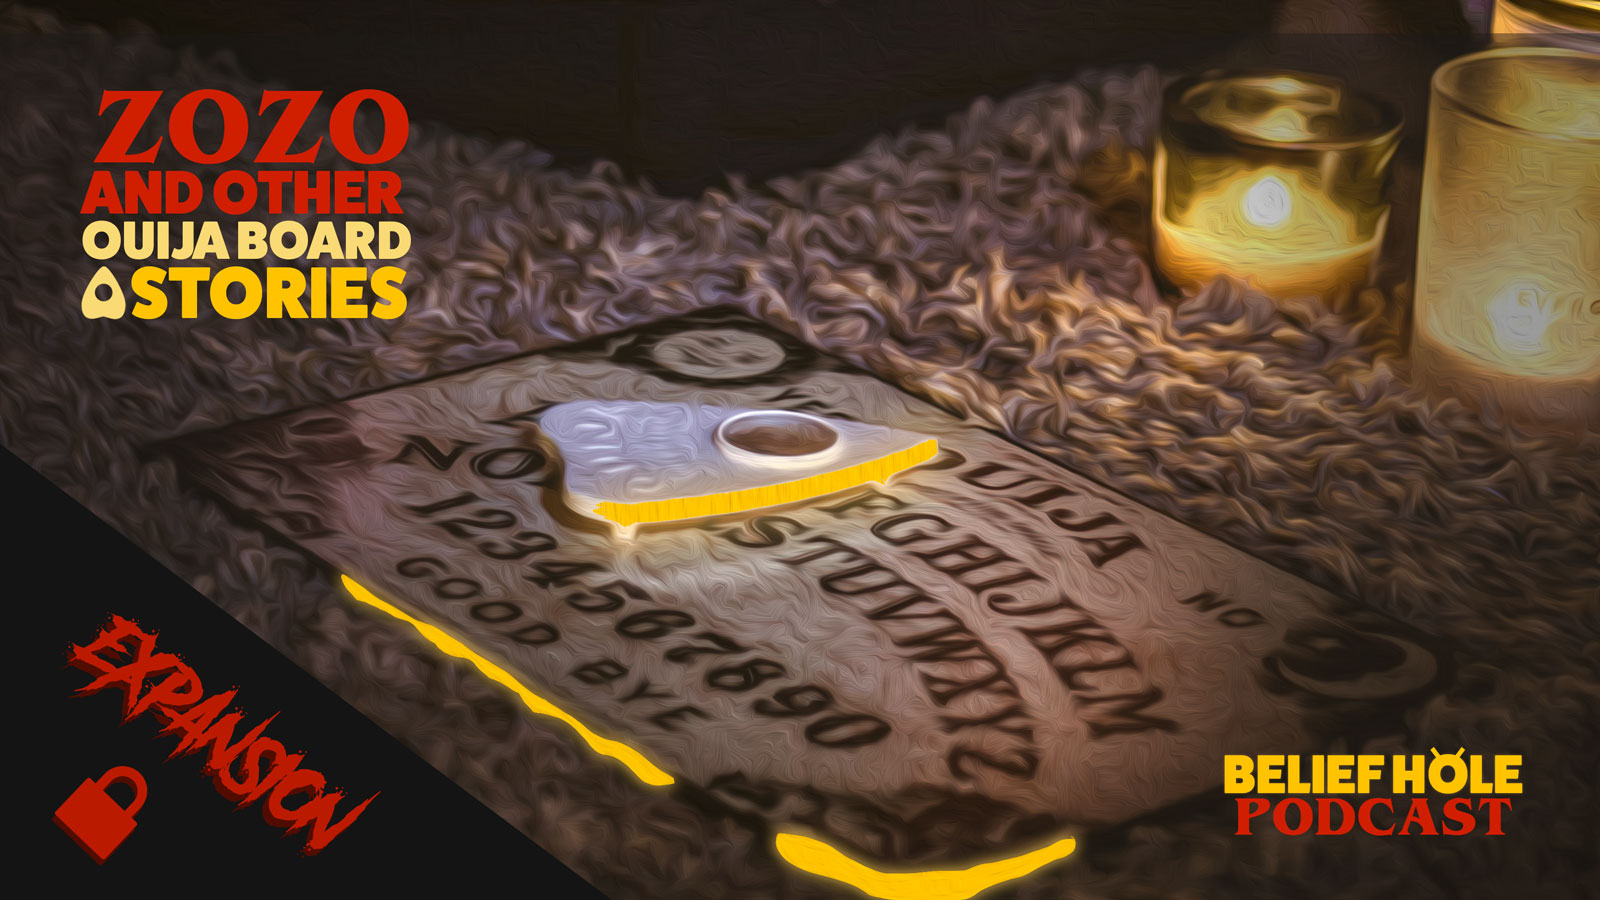 Ouija Boards Gone Wild: Featuring ZOZO